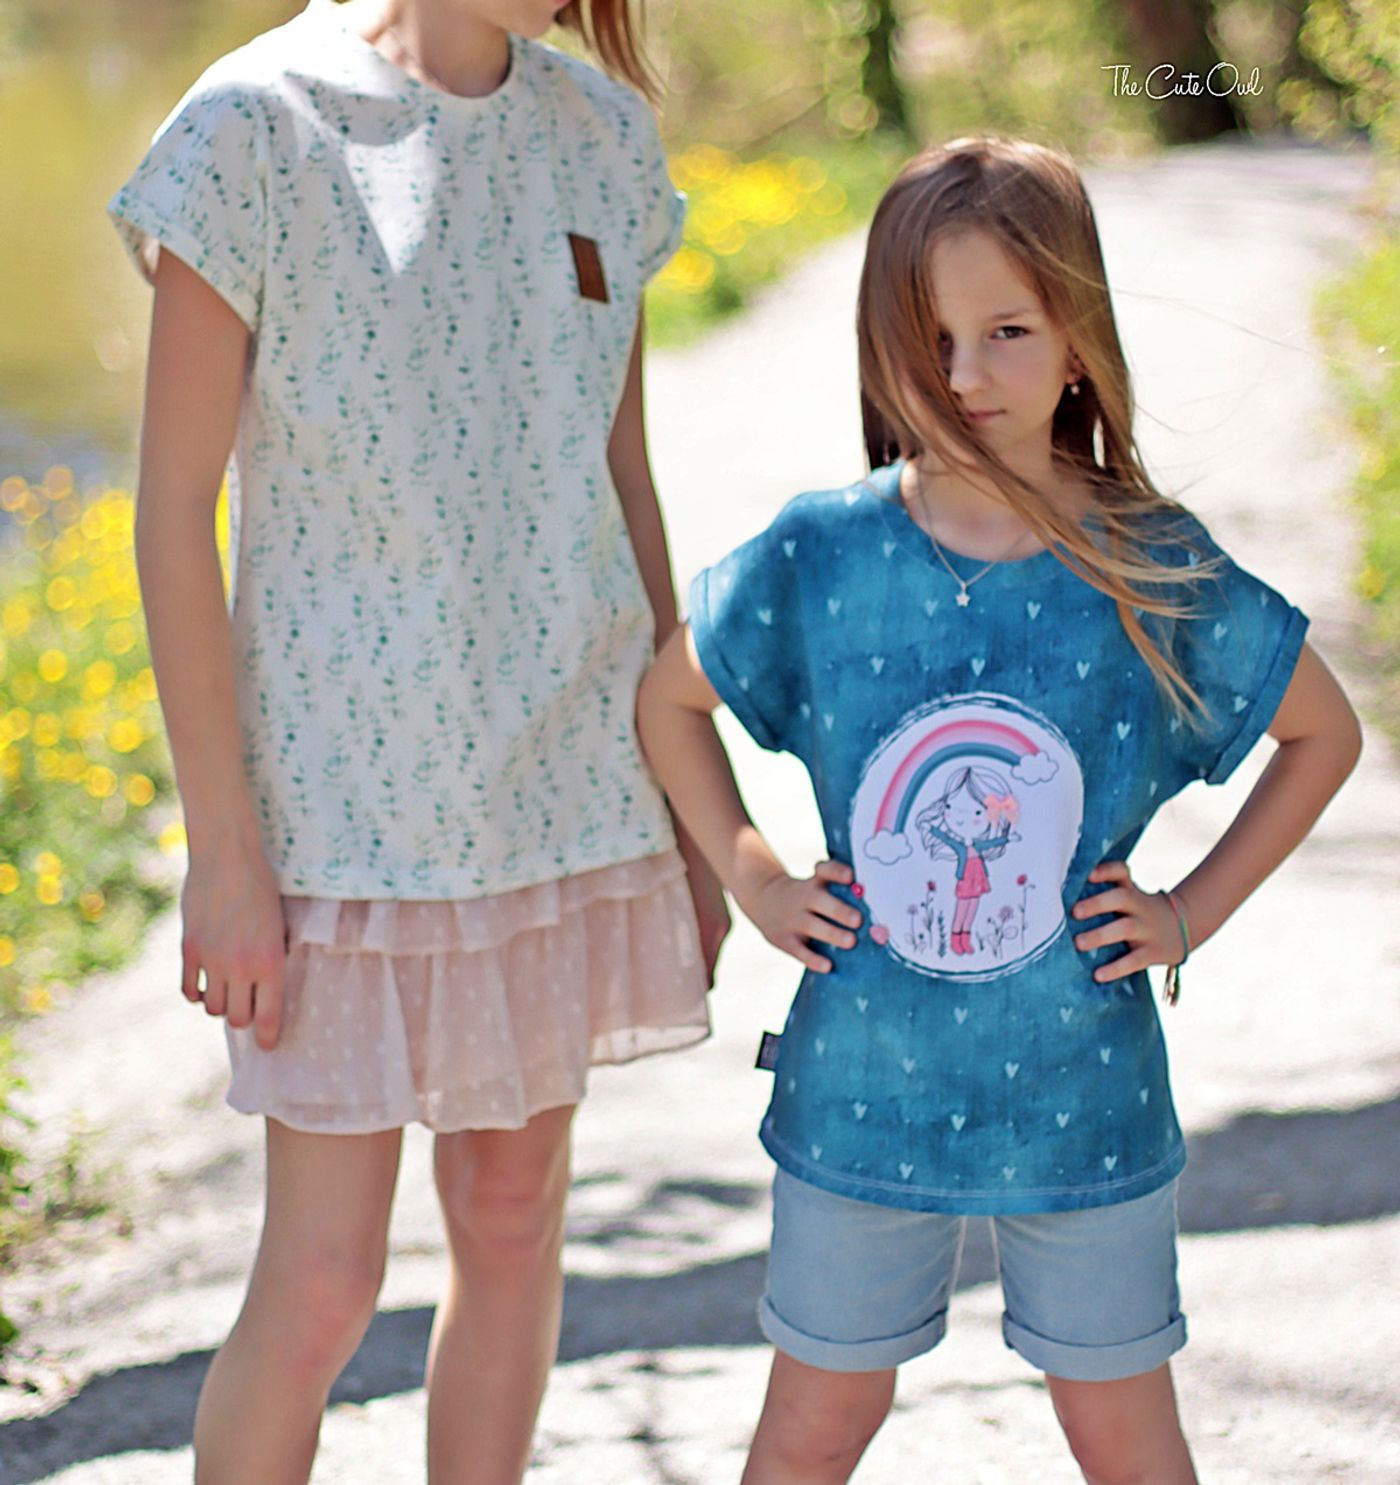 Produktfoto 27 von MiToSa-Kreativ für Schnittmuster Kombi E-Book Family Shirt Kinder, Damen & Männer Gr. 74 - 164, 34 - 52 & XS - 3XL